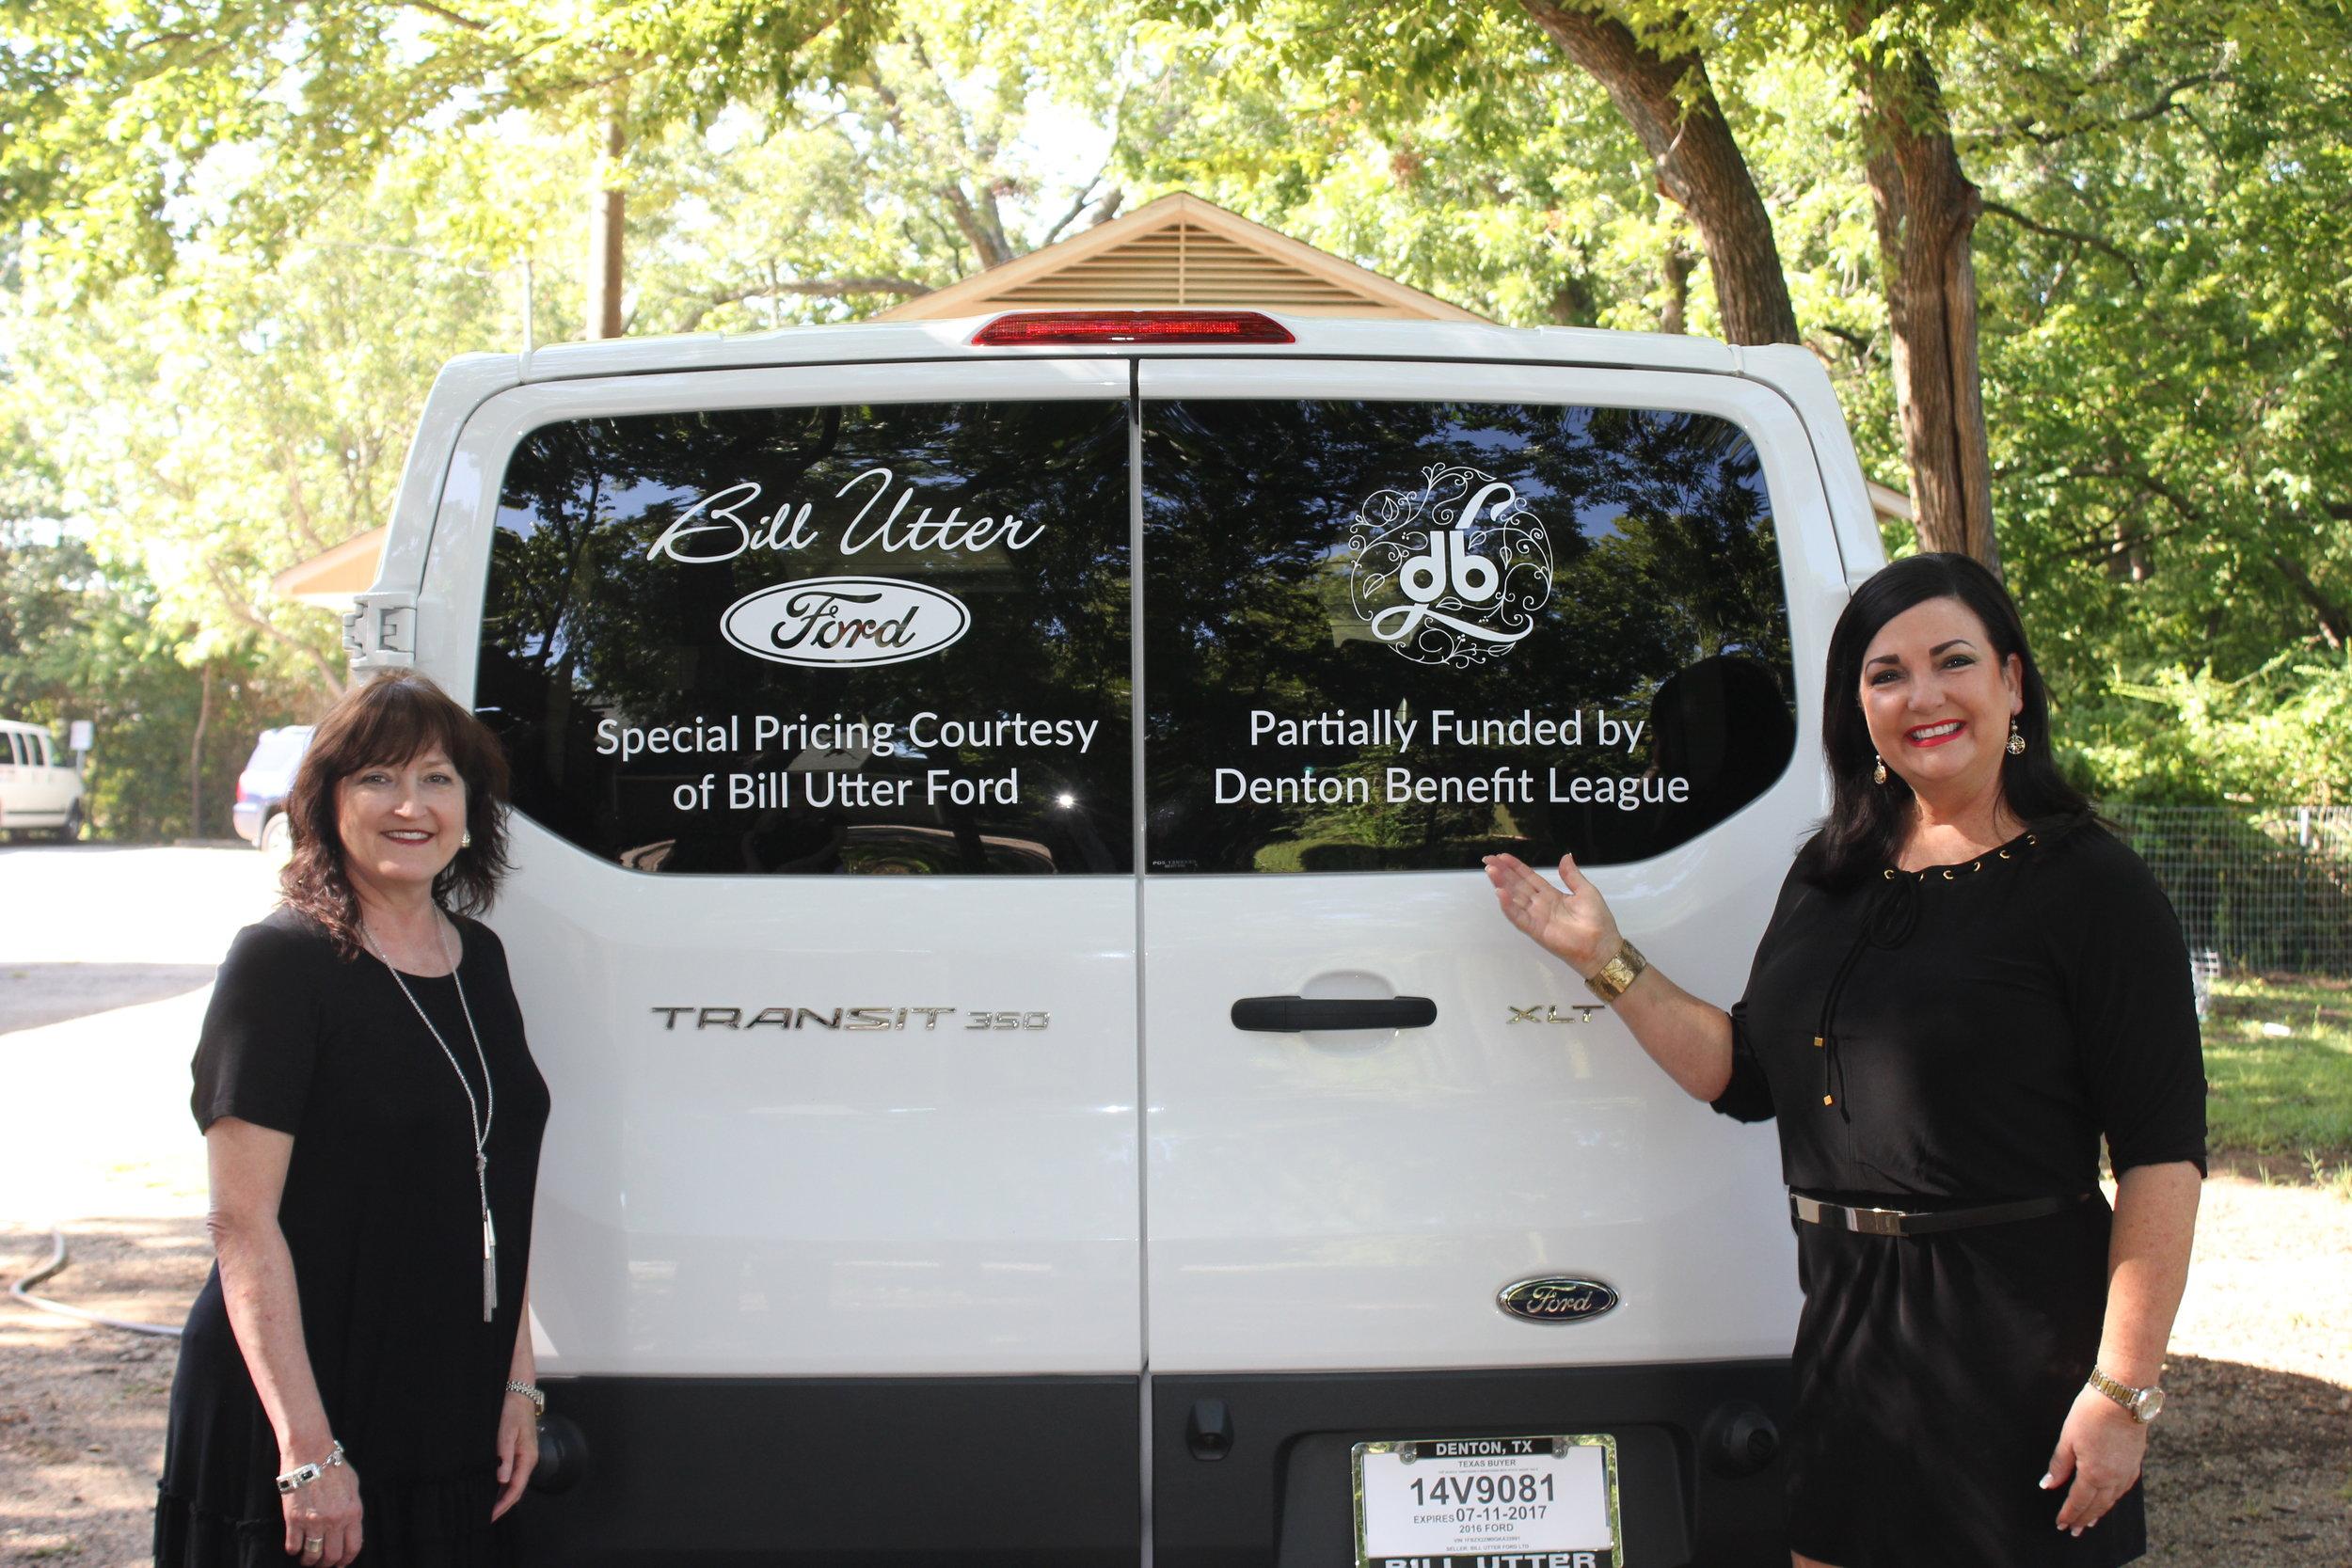 Denton Benefit League Grant Allocations Chair 2017-2018 Sandra Robinson & Denton Benefit League President 2017-2018 Terri Guthrie